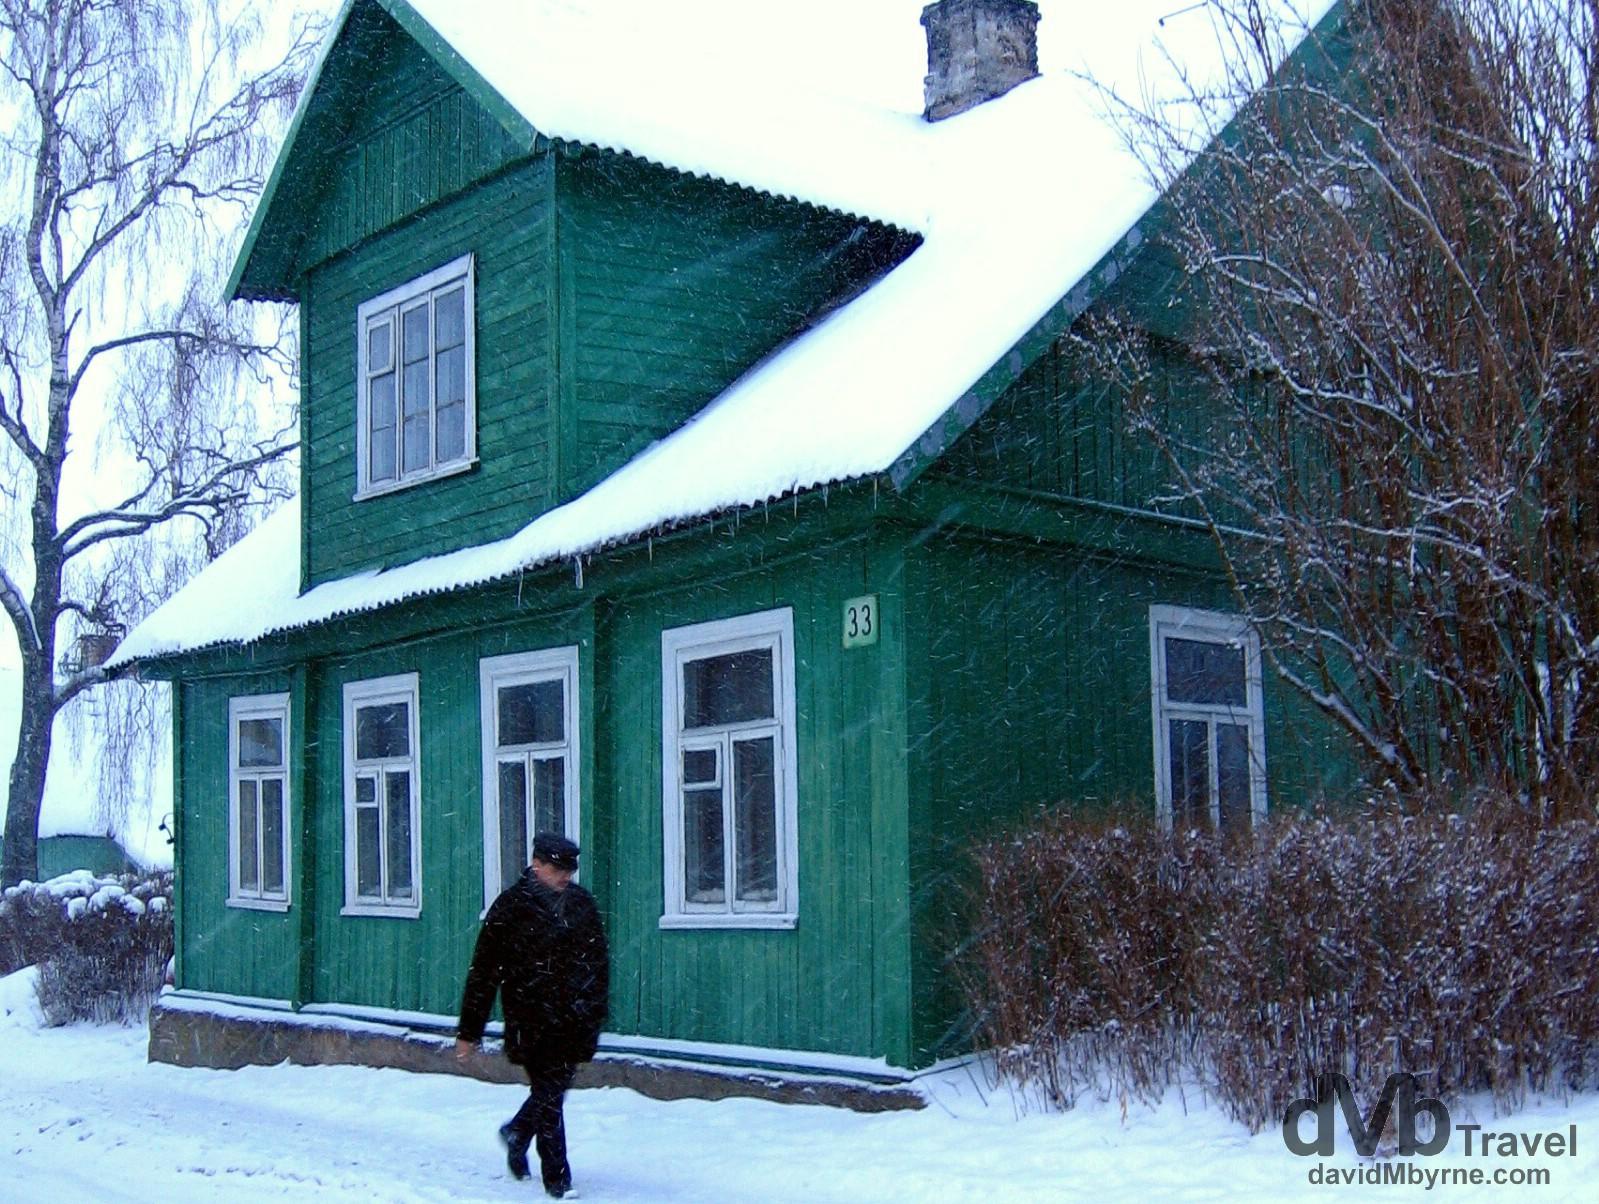 Walking through the village of Trakai during a blizzard. Trakai, Lithuania. March 4, 2006.